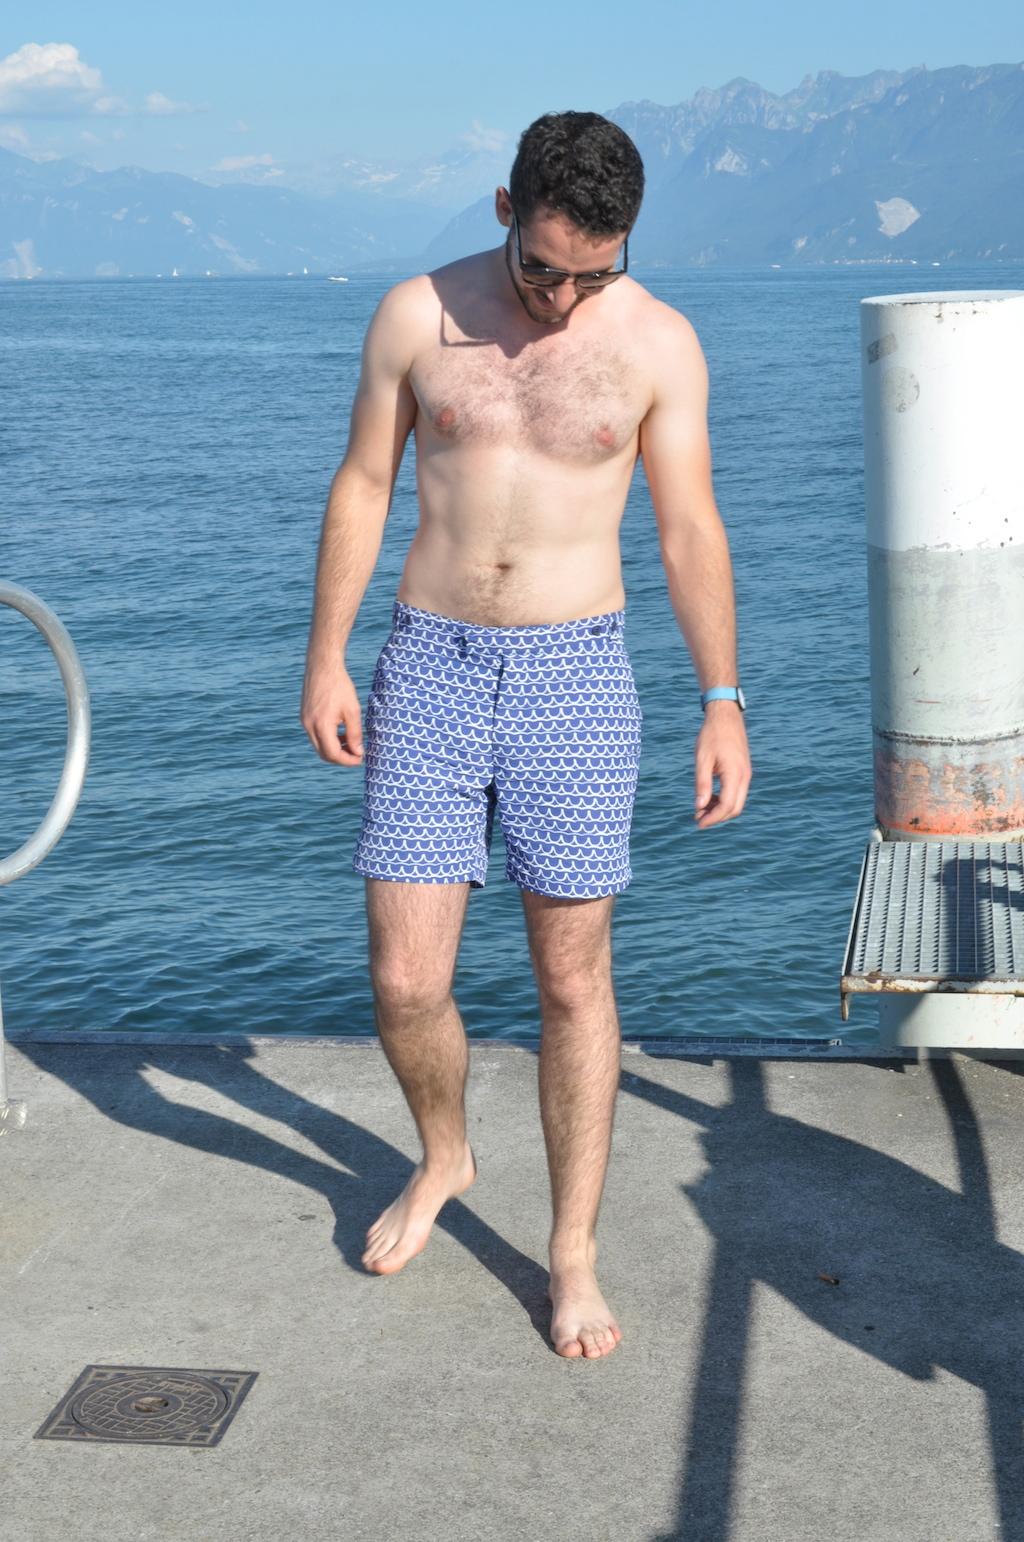 blog mode homme leblogdemonsieur Frescobol Carioca Angarde Robinson les bains MisterMarcel Smith LaTrotteuse